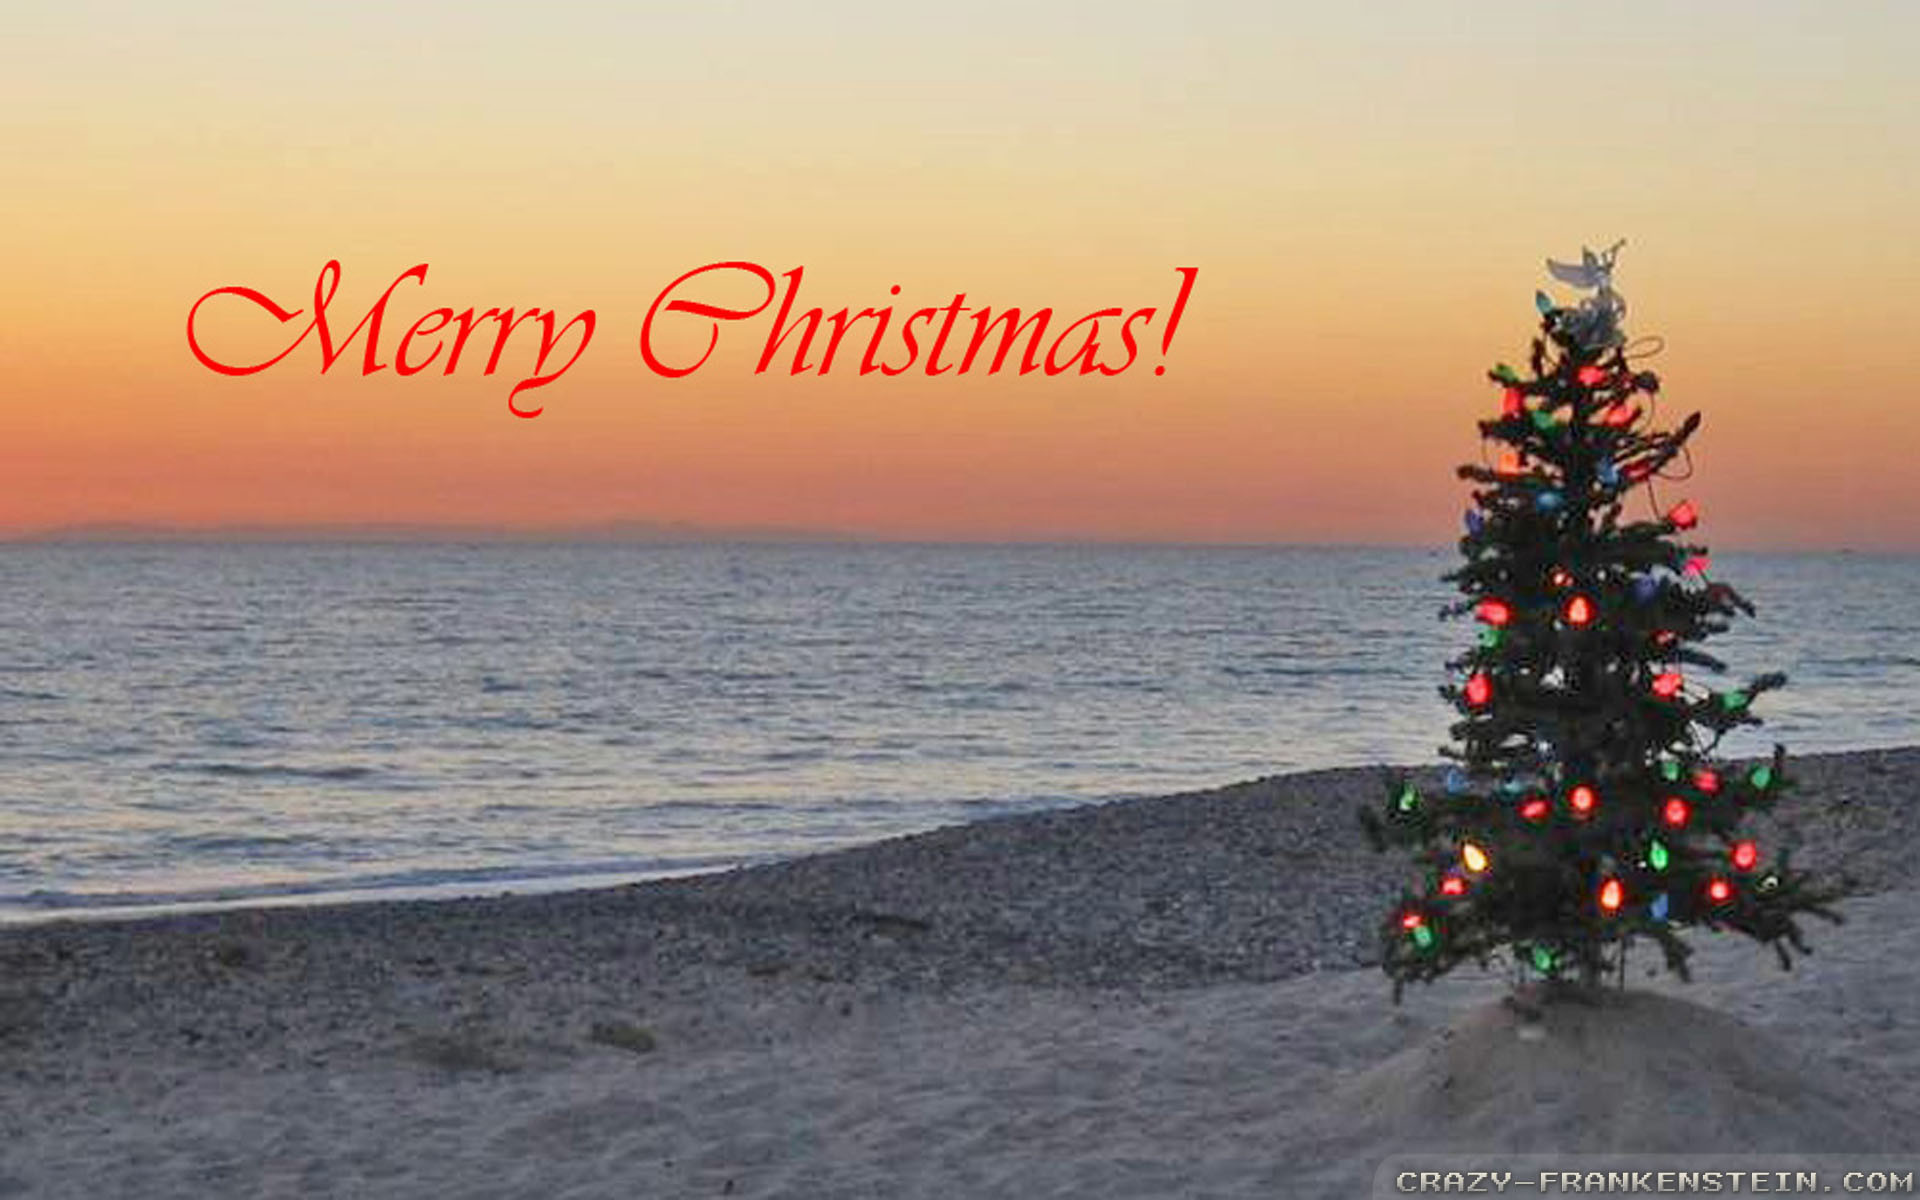 Wallpaper: Christmas treeon beach island wallpapers. Resolution: 1024×768 |  1280×1024 | 1600×1200. Widescreen Res: 1440×900 | 1680×1050 | 1920×1200